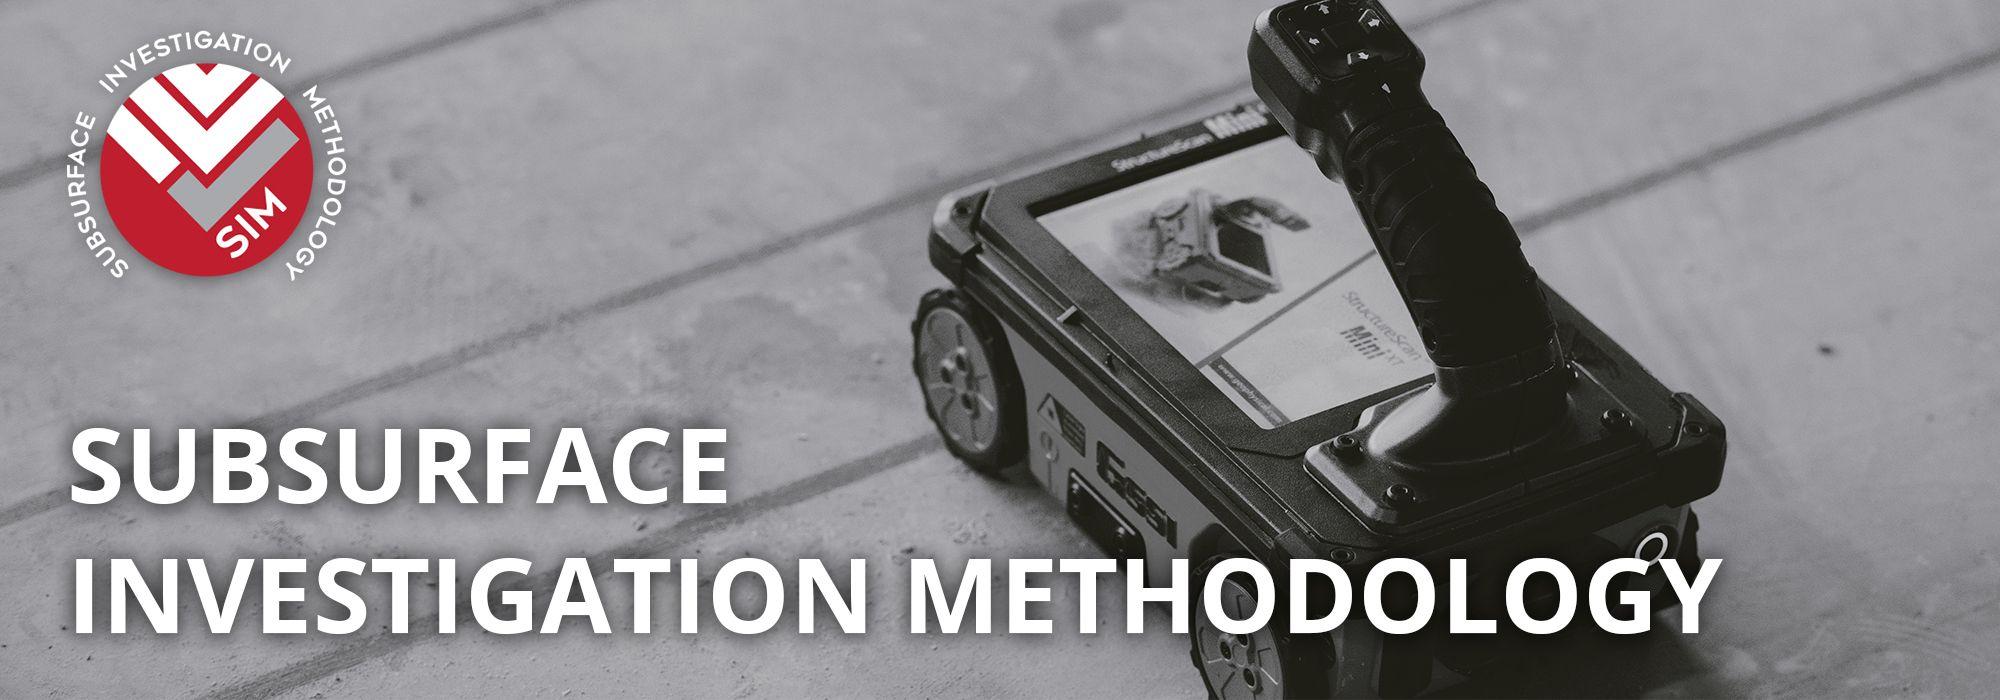 Subsurface Investigation Methodology